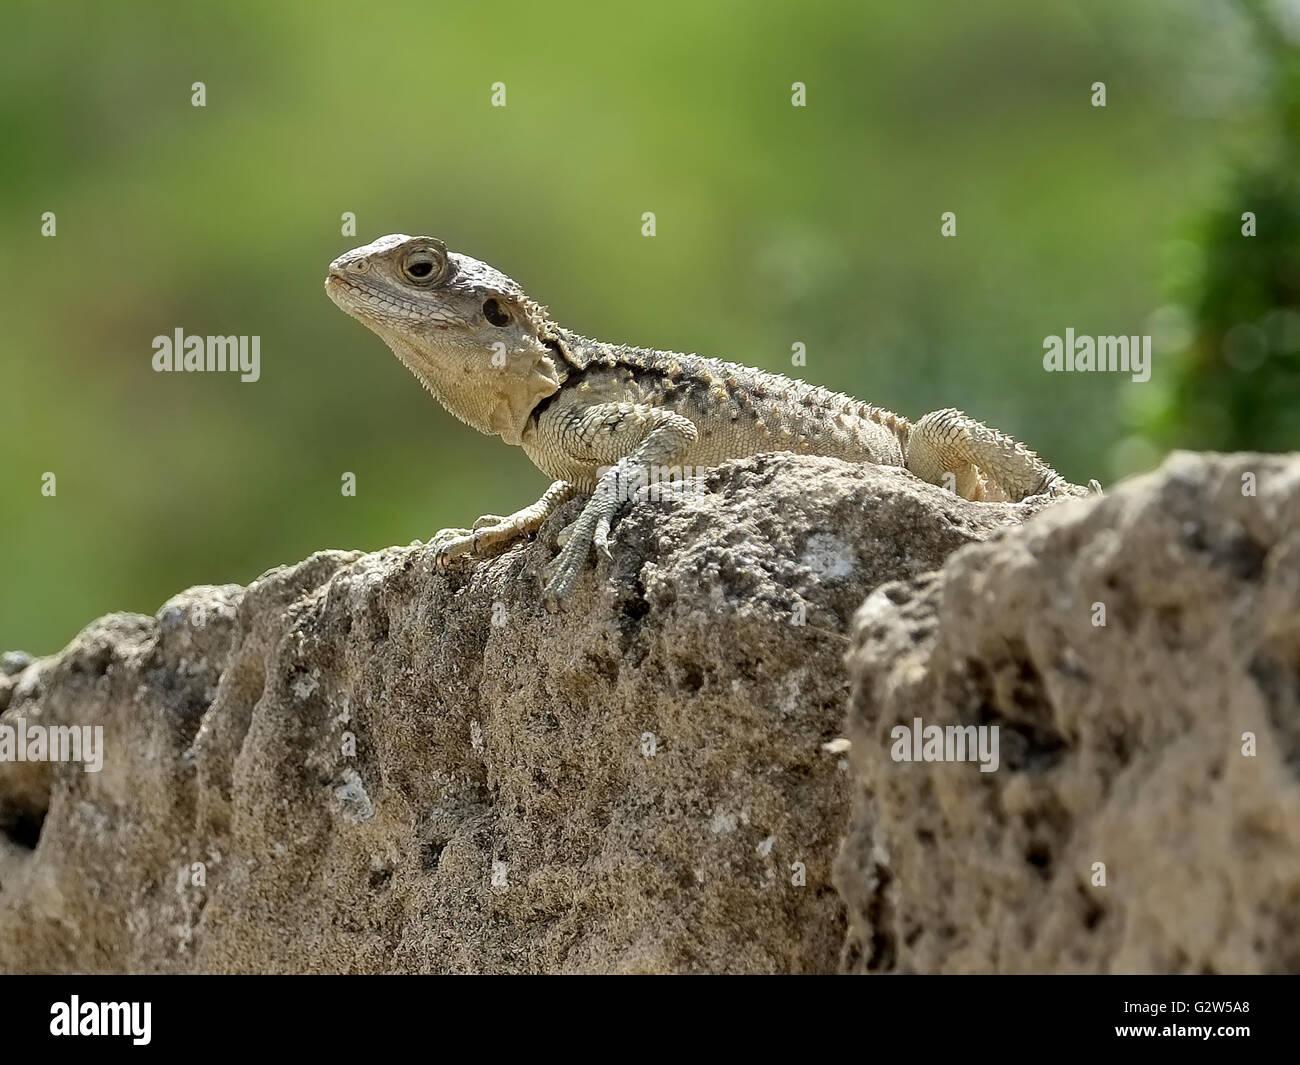 Gecko Lizard (infraorder Gekkota) su una roccia, salami, Famagosta, (Gazimagusa), la parte settentrionale di Cipro. Immagini Stock